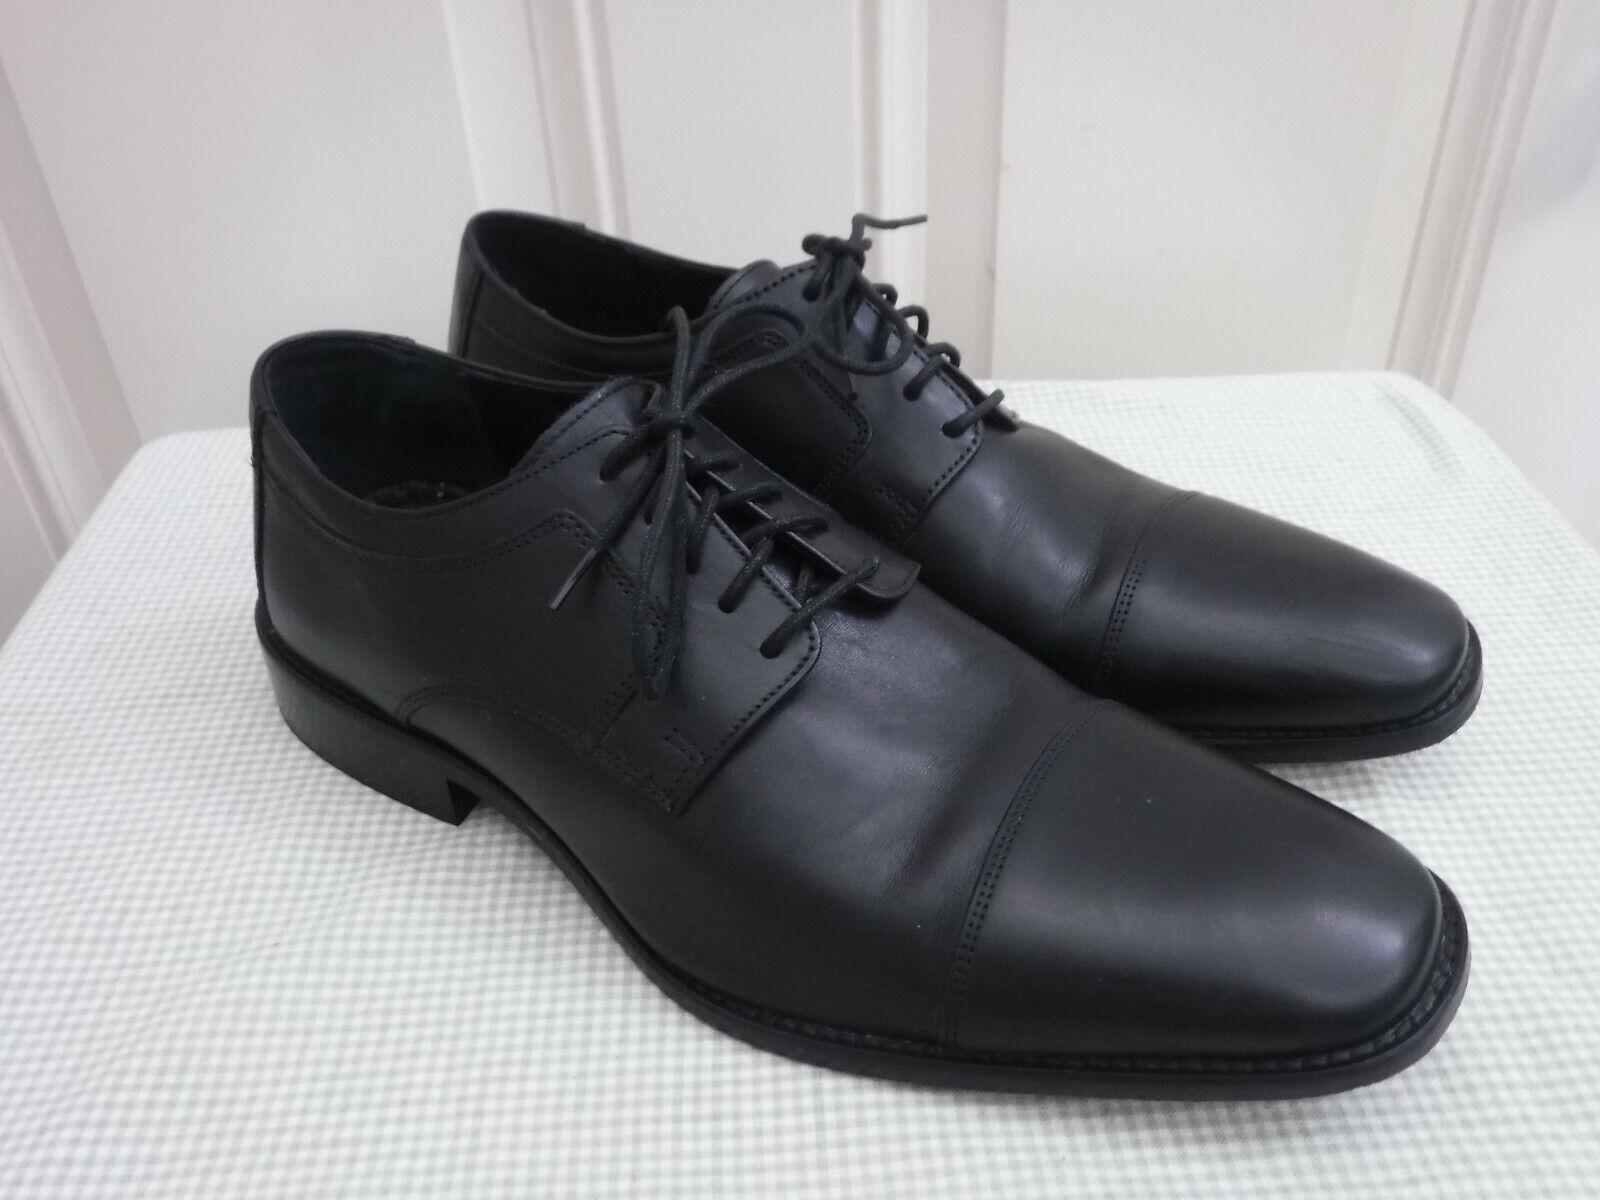 Men's JOHNSTON & MURPHY J. MURPHY 12 Black Leather Lace Cap Toe Dress Oxfords